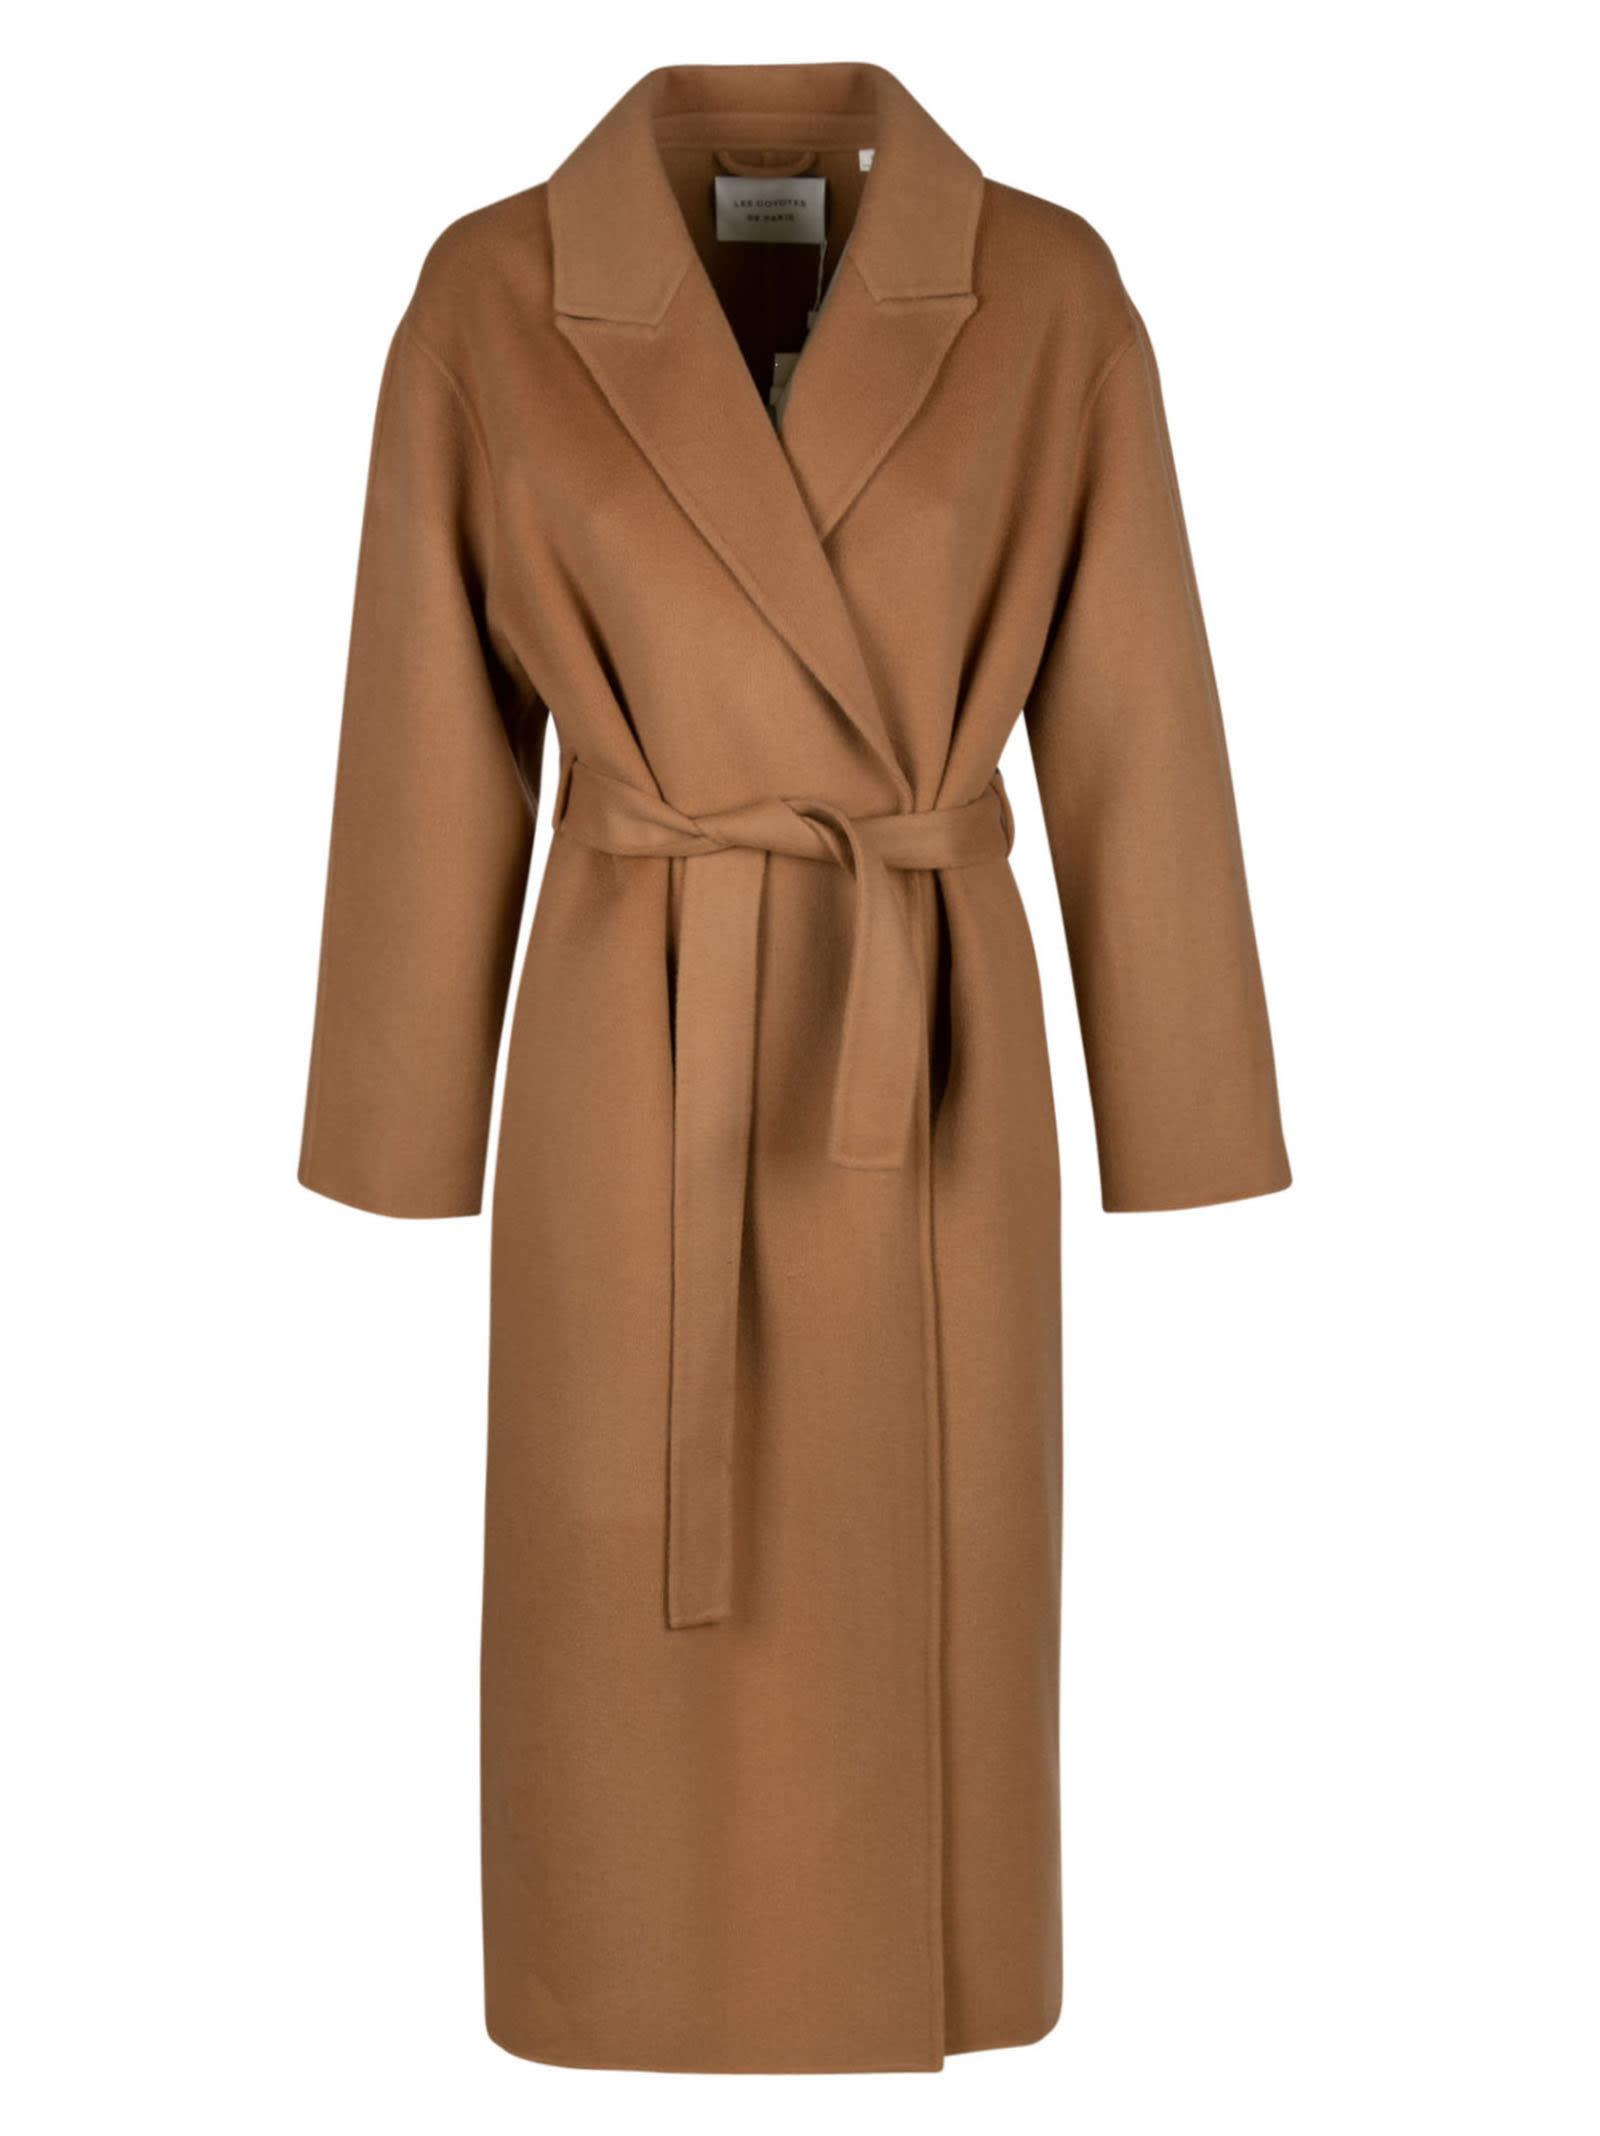 Etty Coat